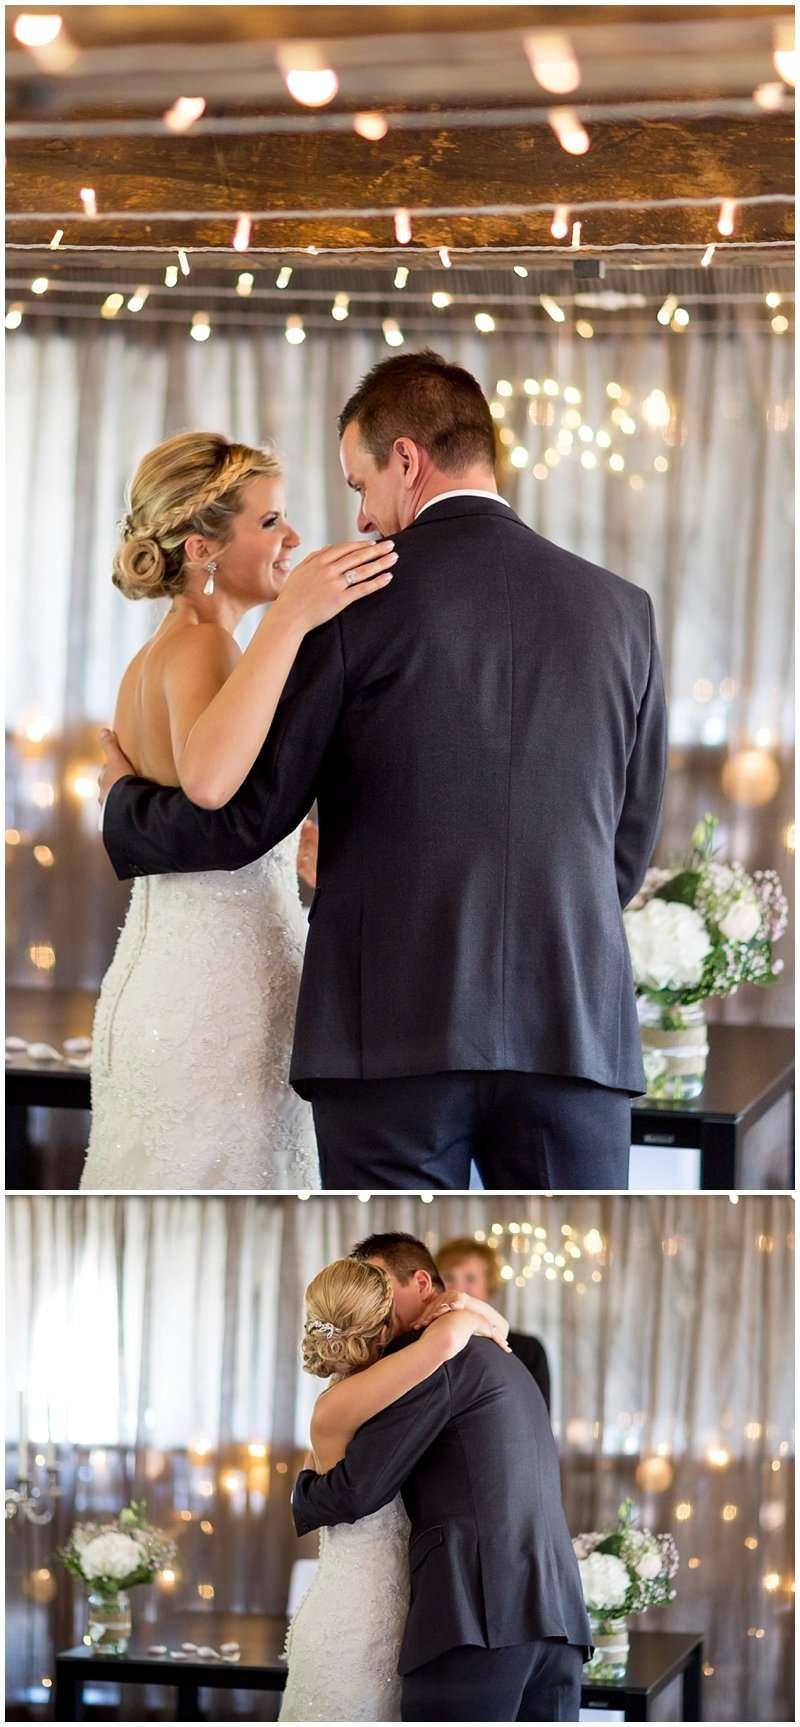 NIKKI AND SCOTT'S TUDDENHAM MILL WEDDING - SUFFOLK WEDDING PHOTOGRAPHER 9